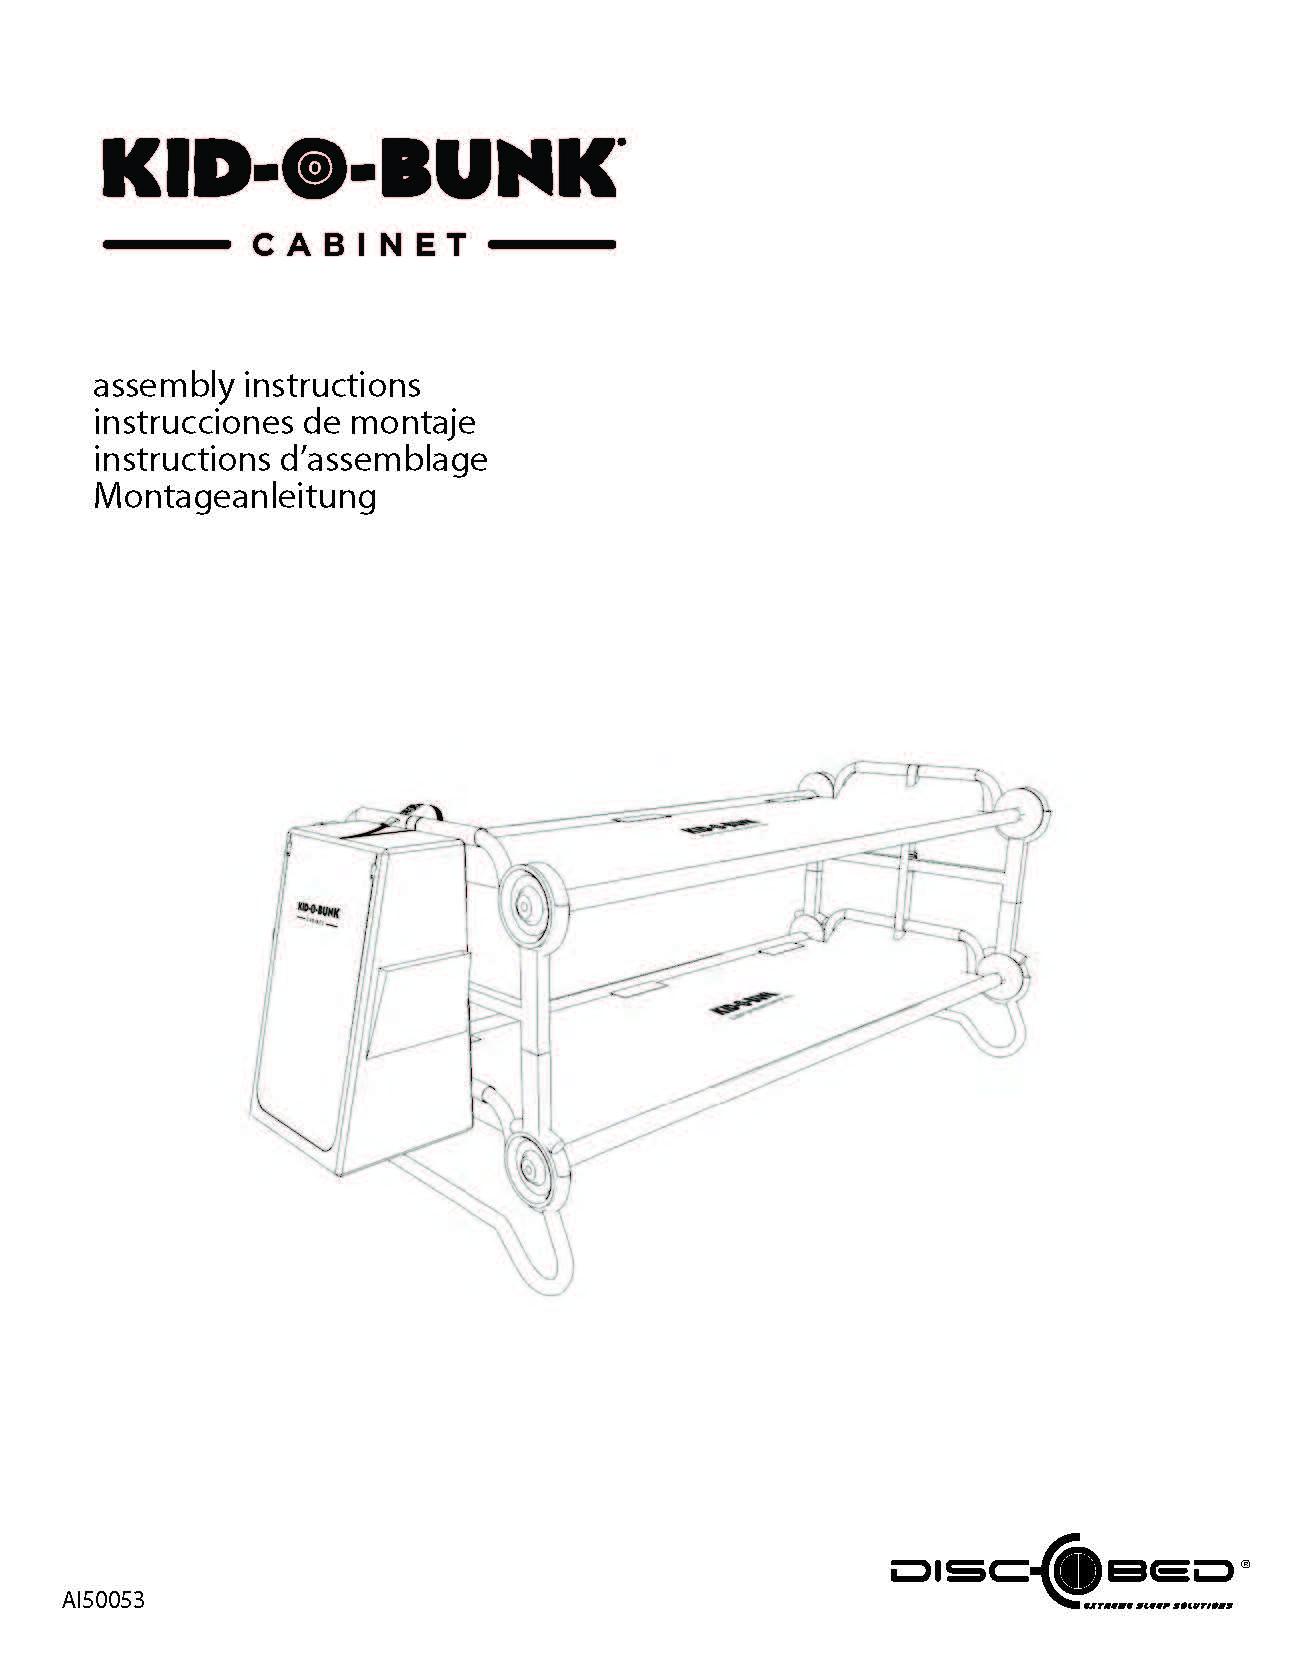 Kid O Bunk Cabinet